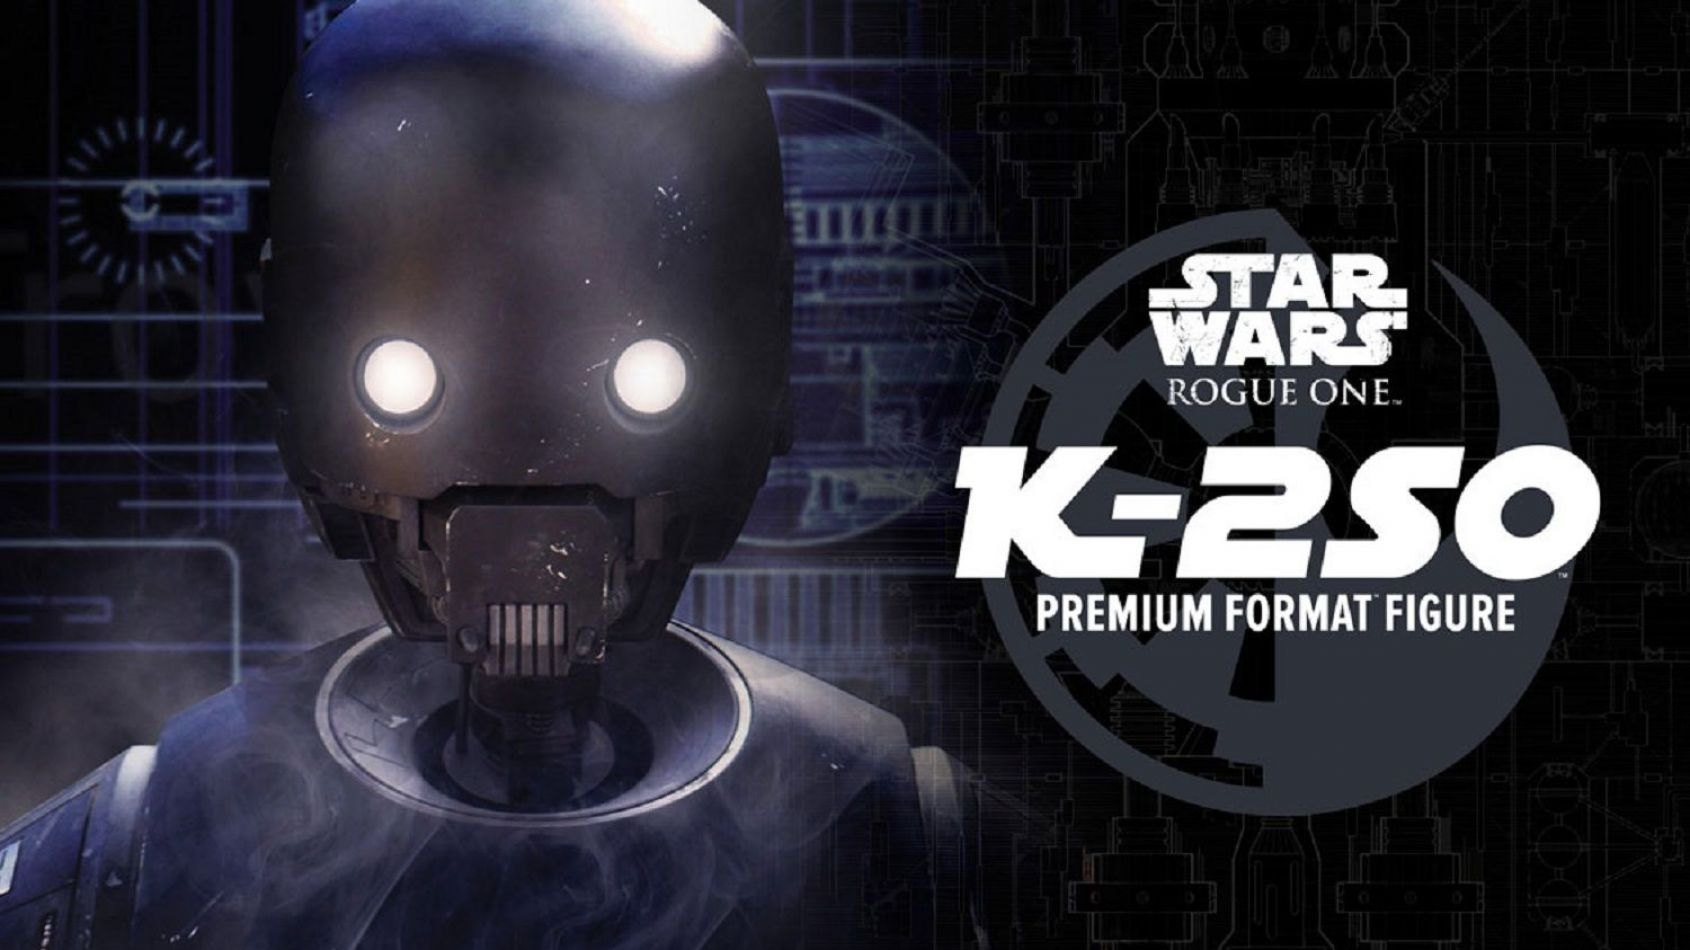 La figurine Sideshow Format Premium de K2SO en vidéo